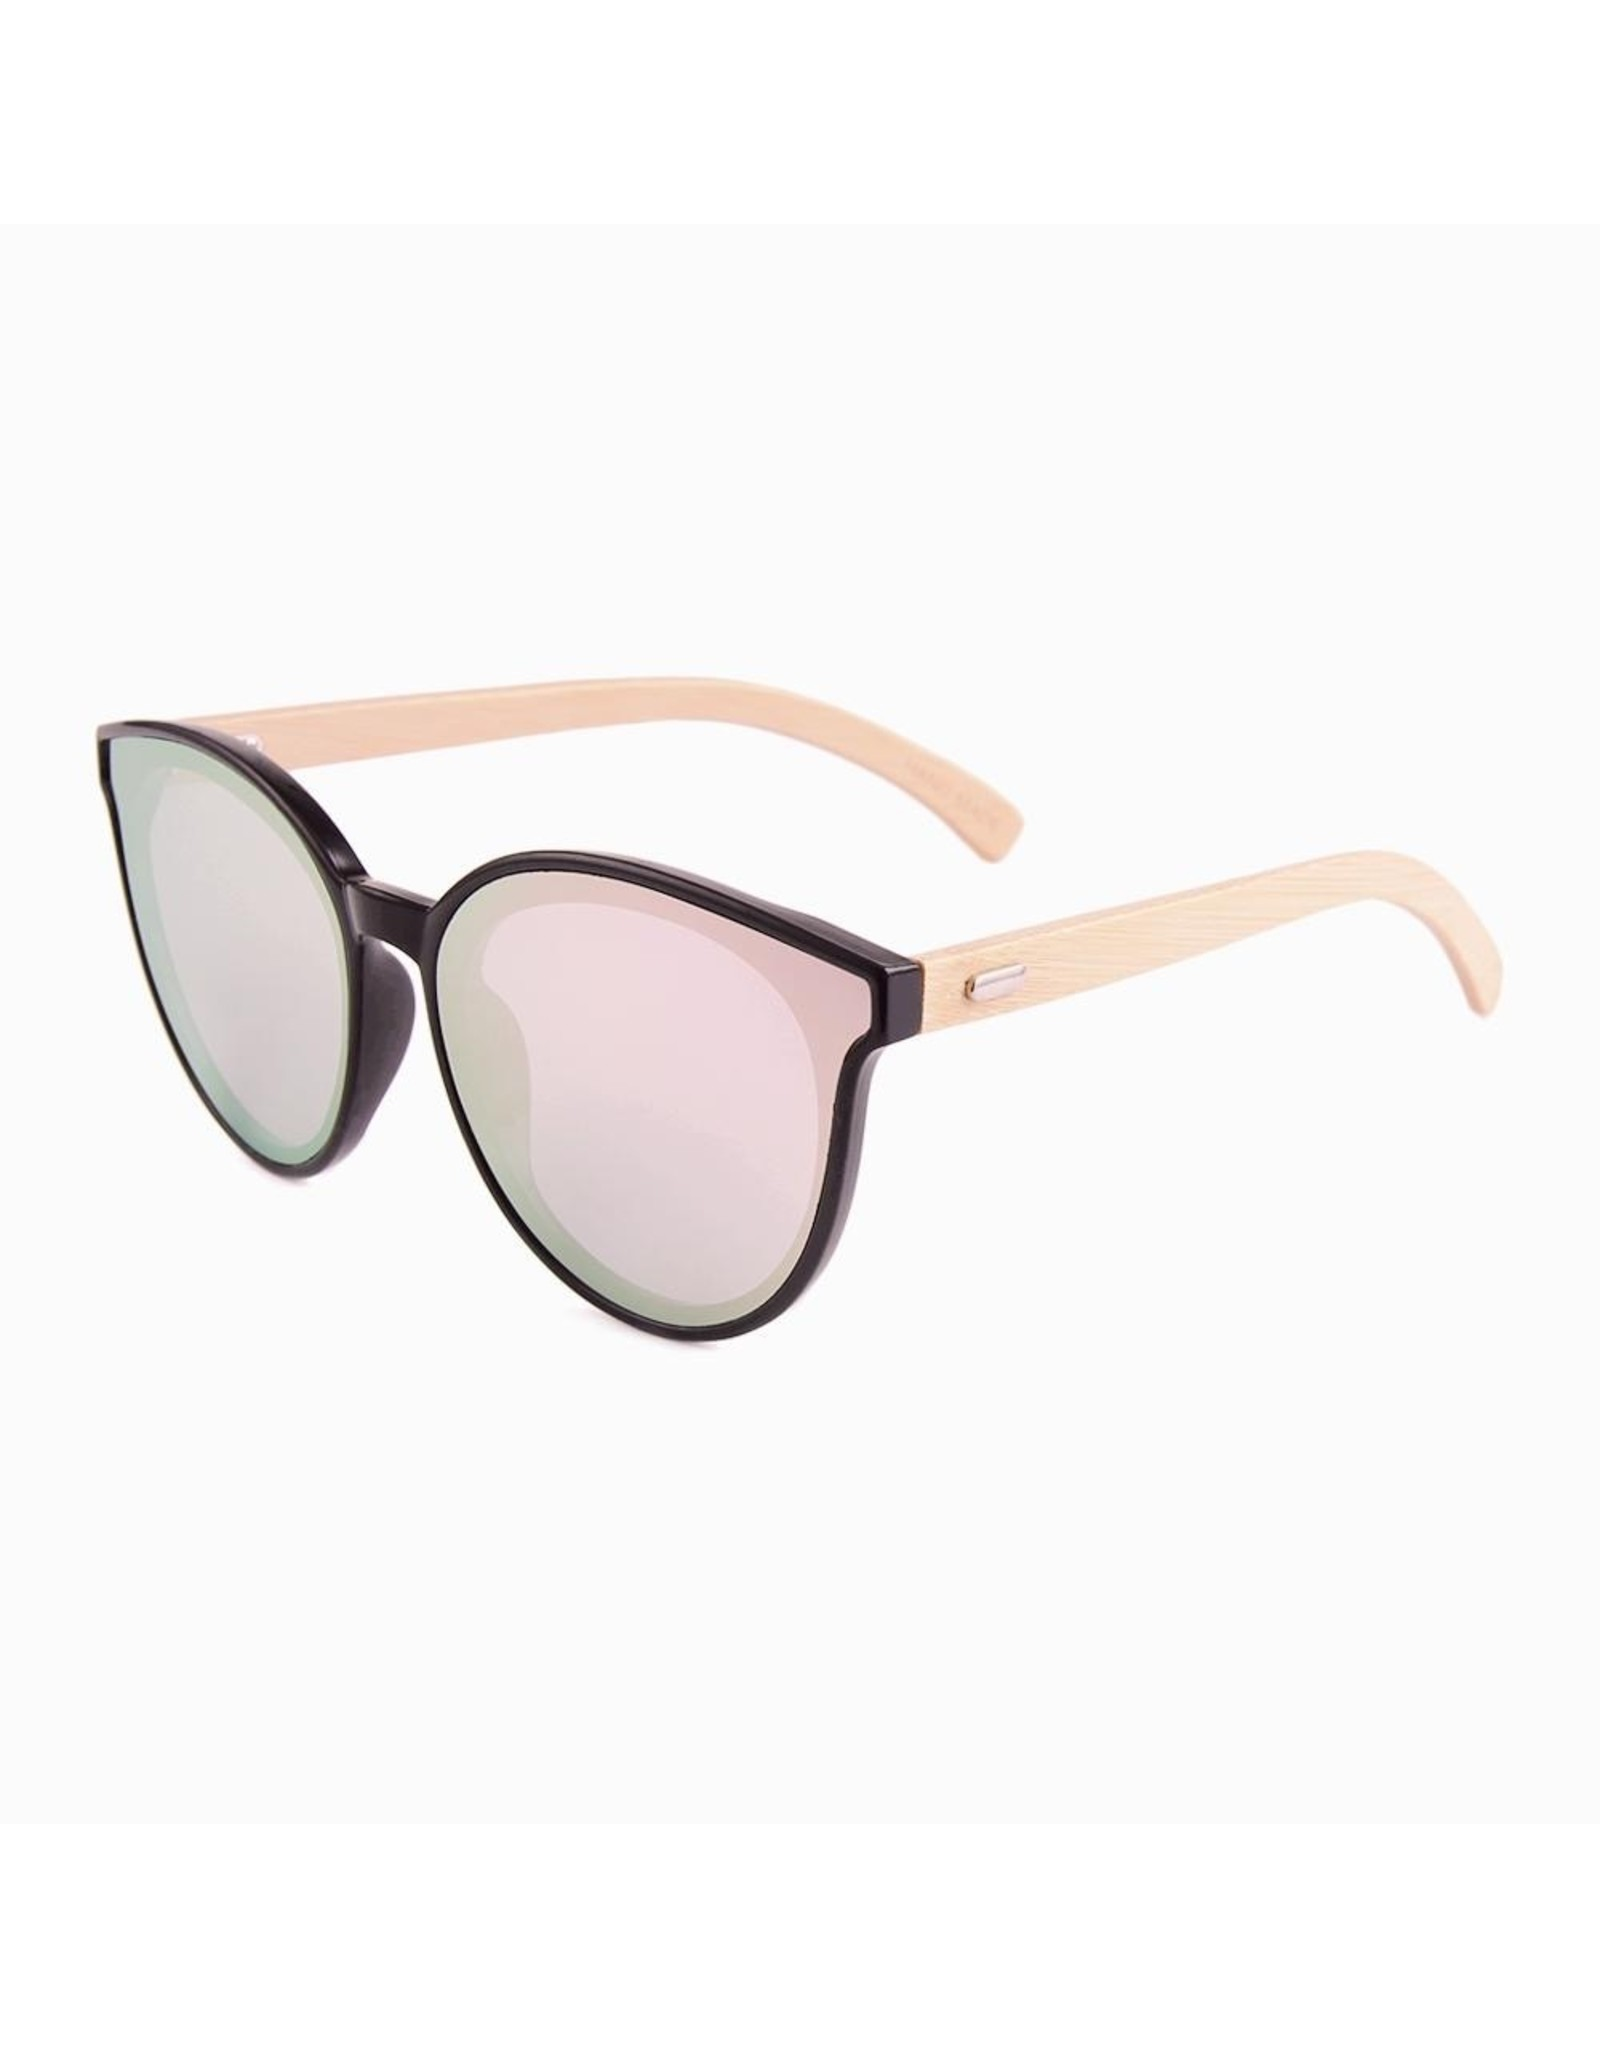 Kuma Eyewear - Elm Sunglasses